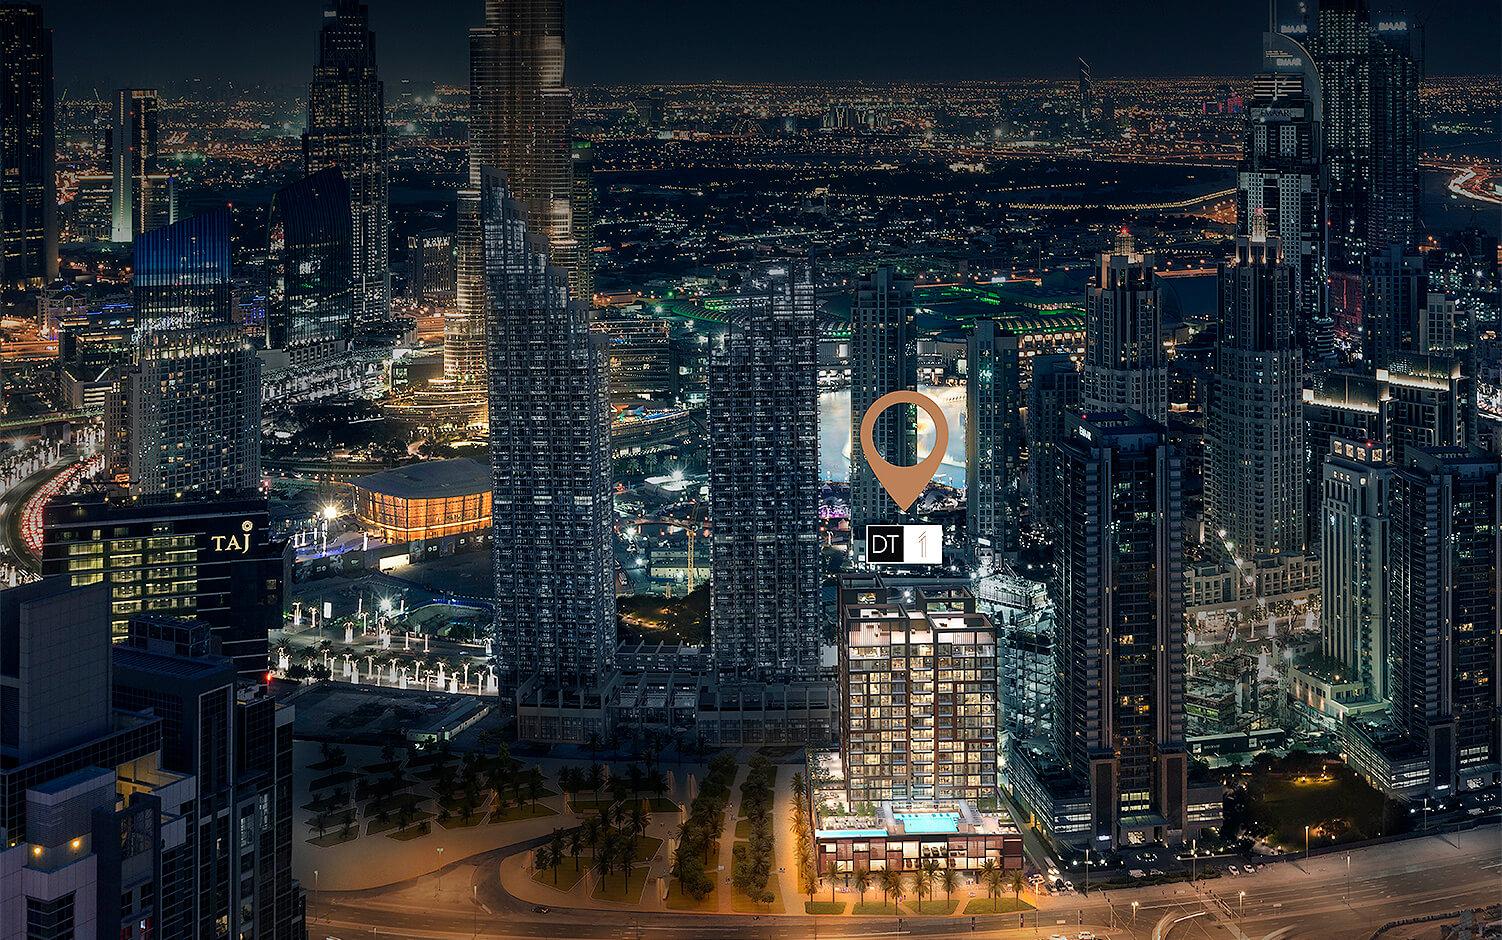 dt1 in Downtown Dubai